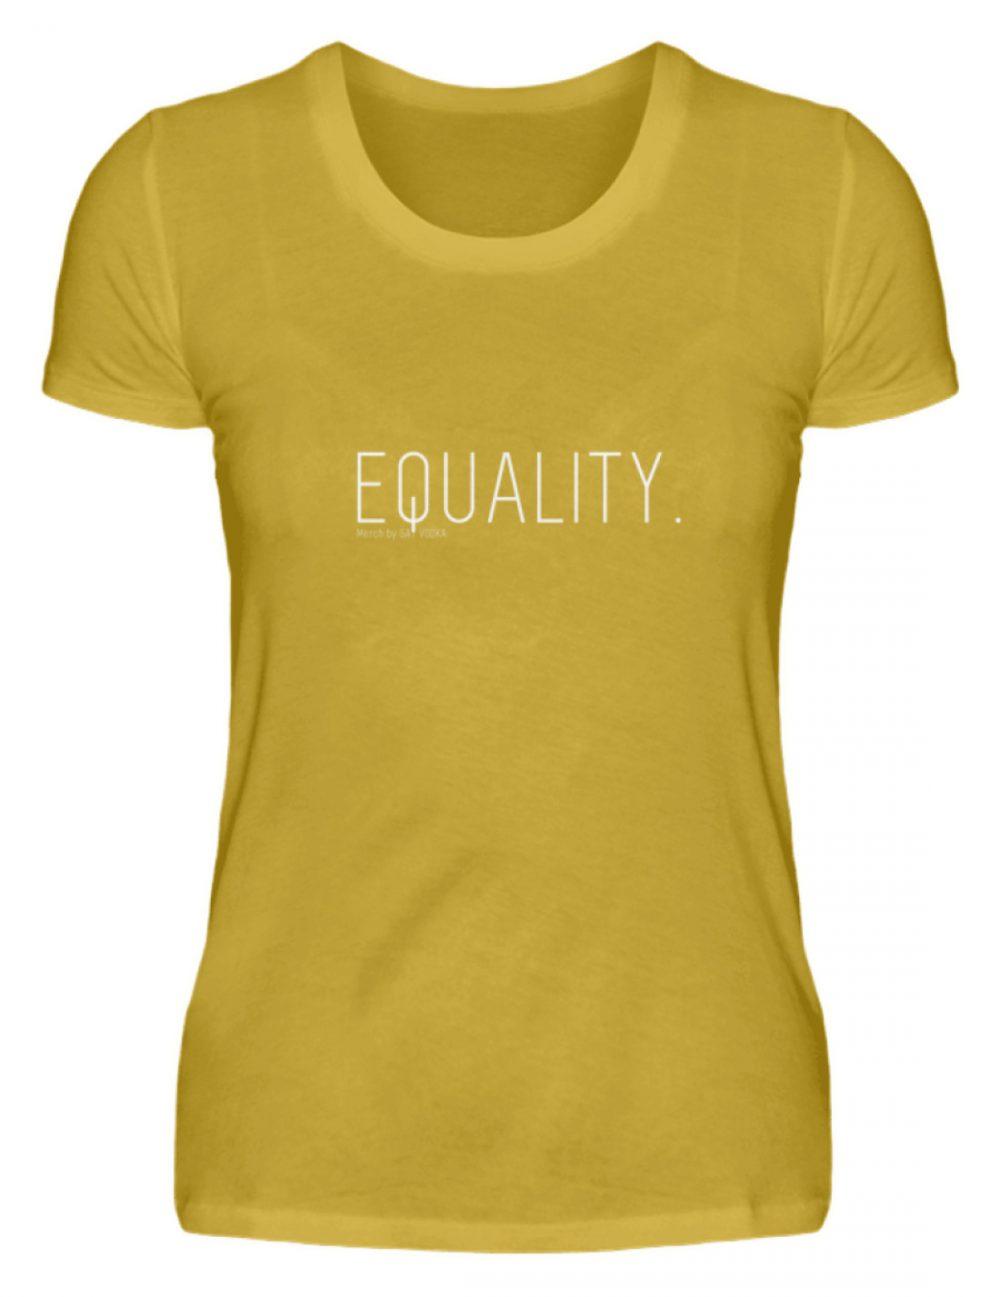 EQUALITY. - Damen Premiumshirt-2980